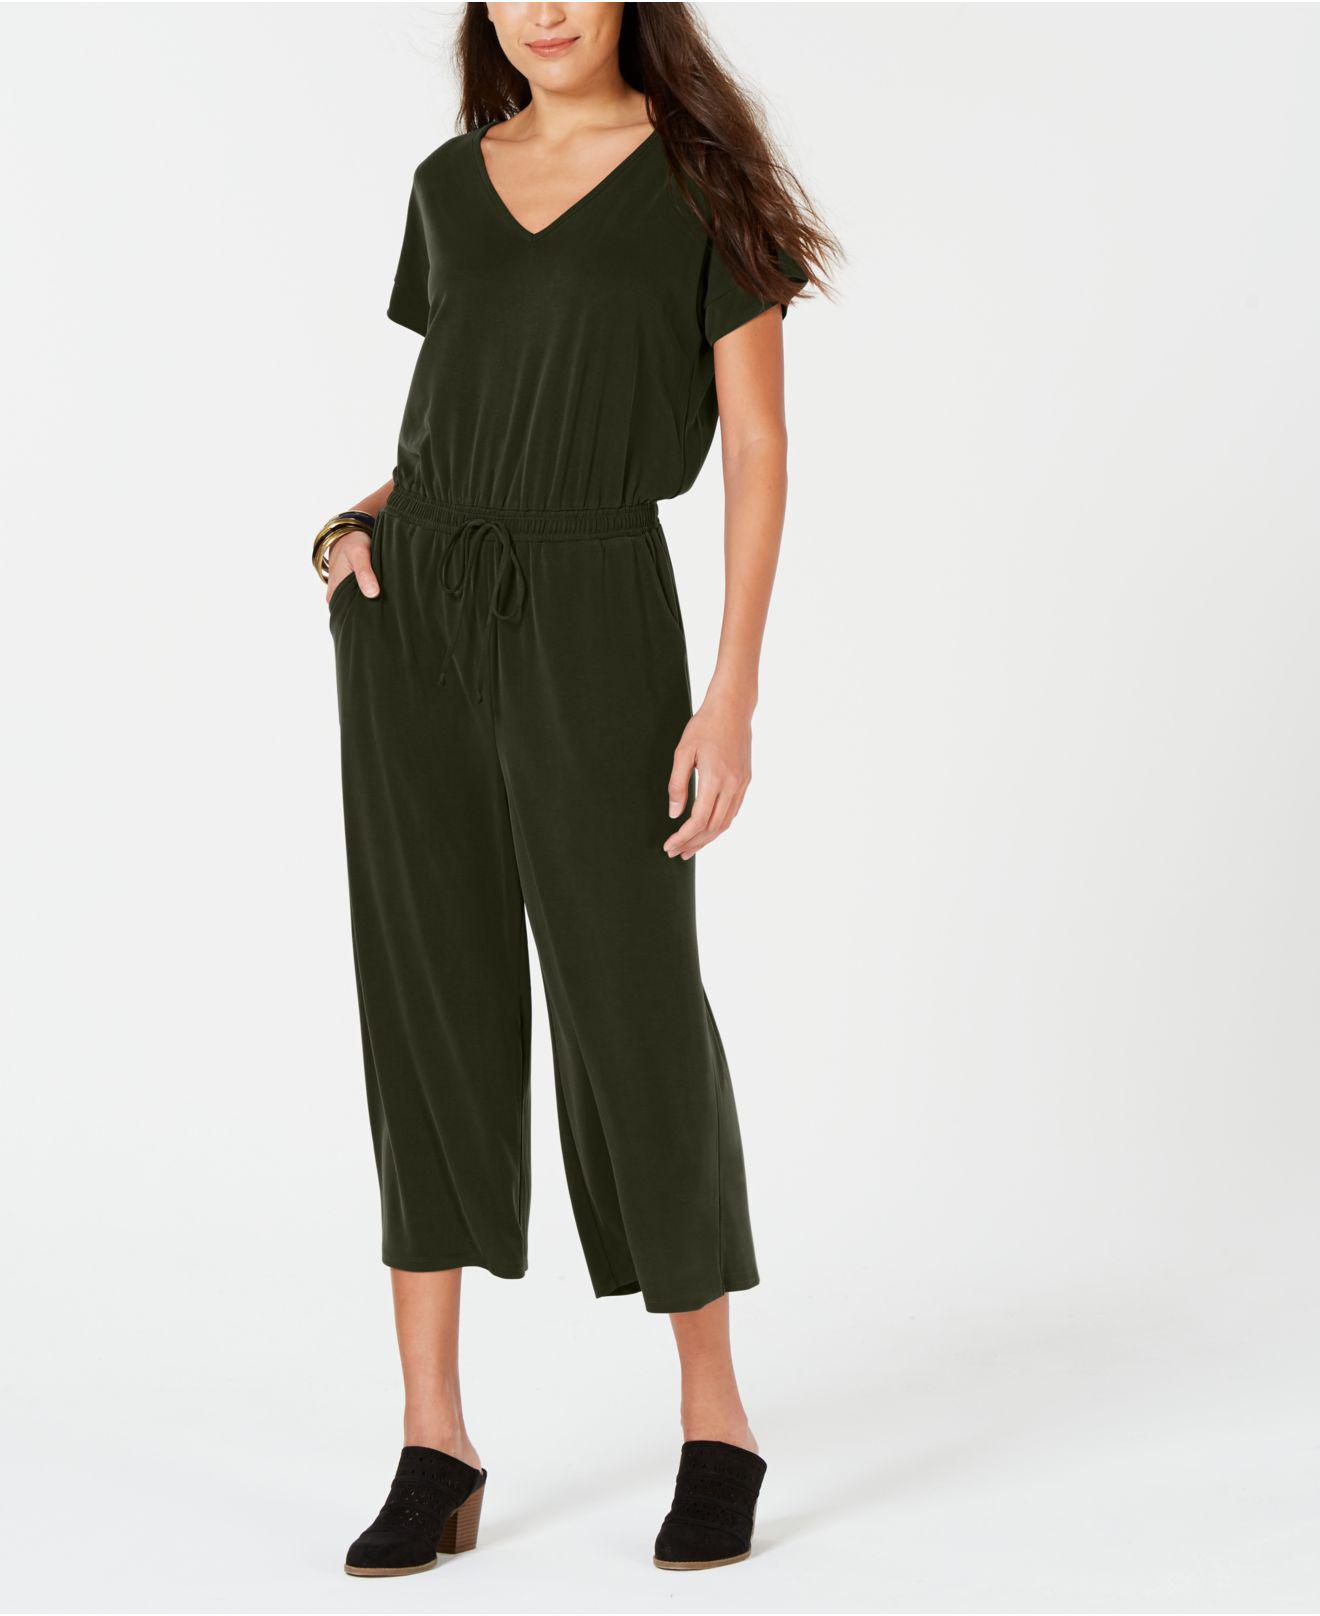 97da354f42a Style   Co. Women s Green Petite Cropped V-neck Jumpsuit ...